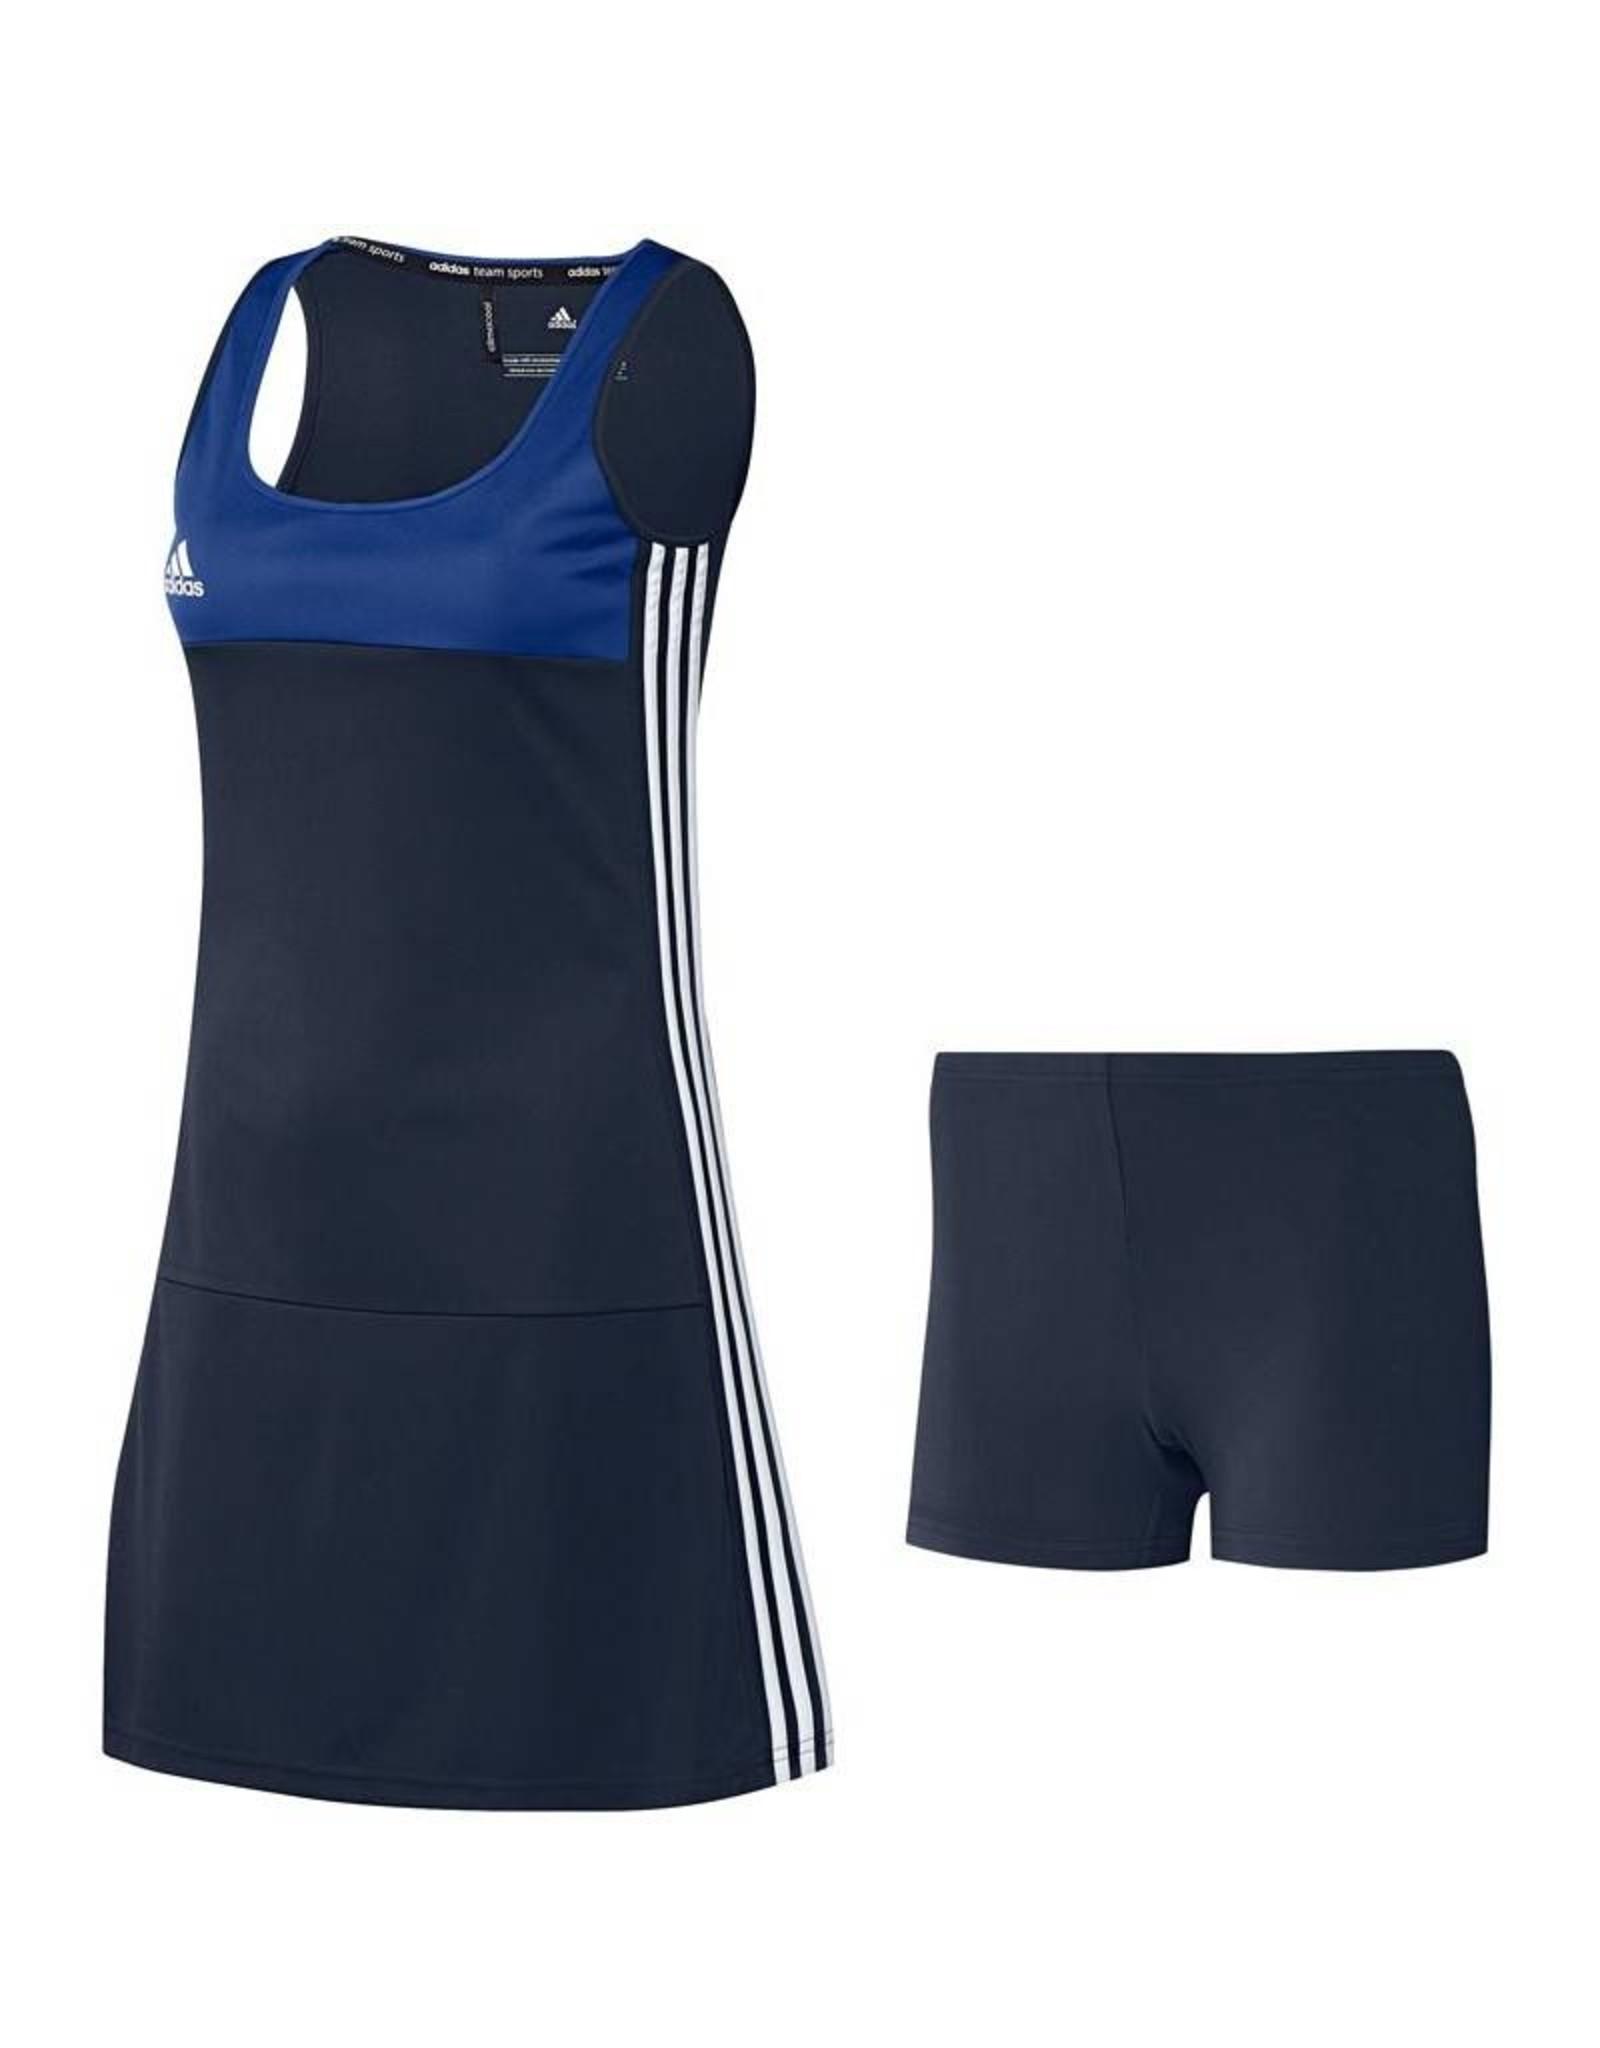 Adidas T16 Dress Woman & Girls